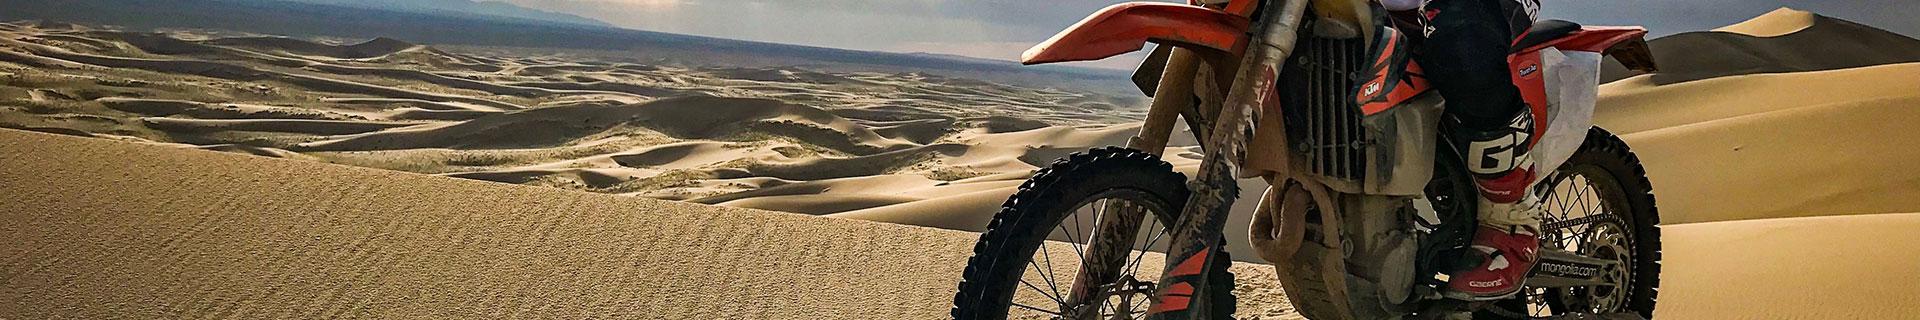 mongolei-enduro-reise-slider-02